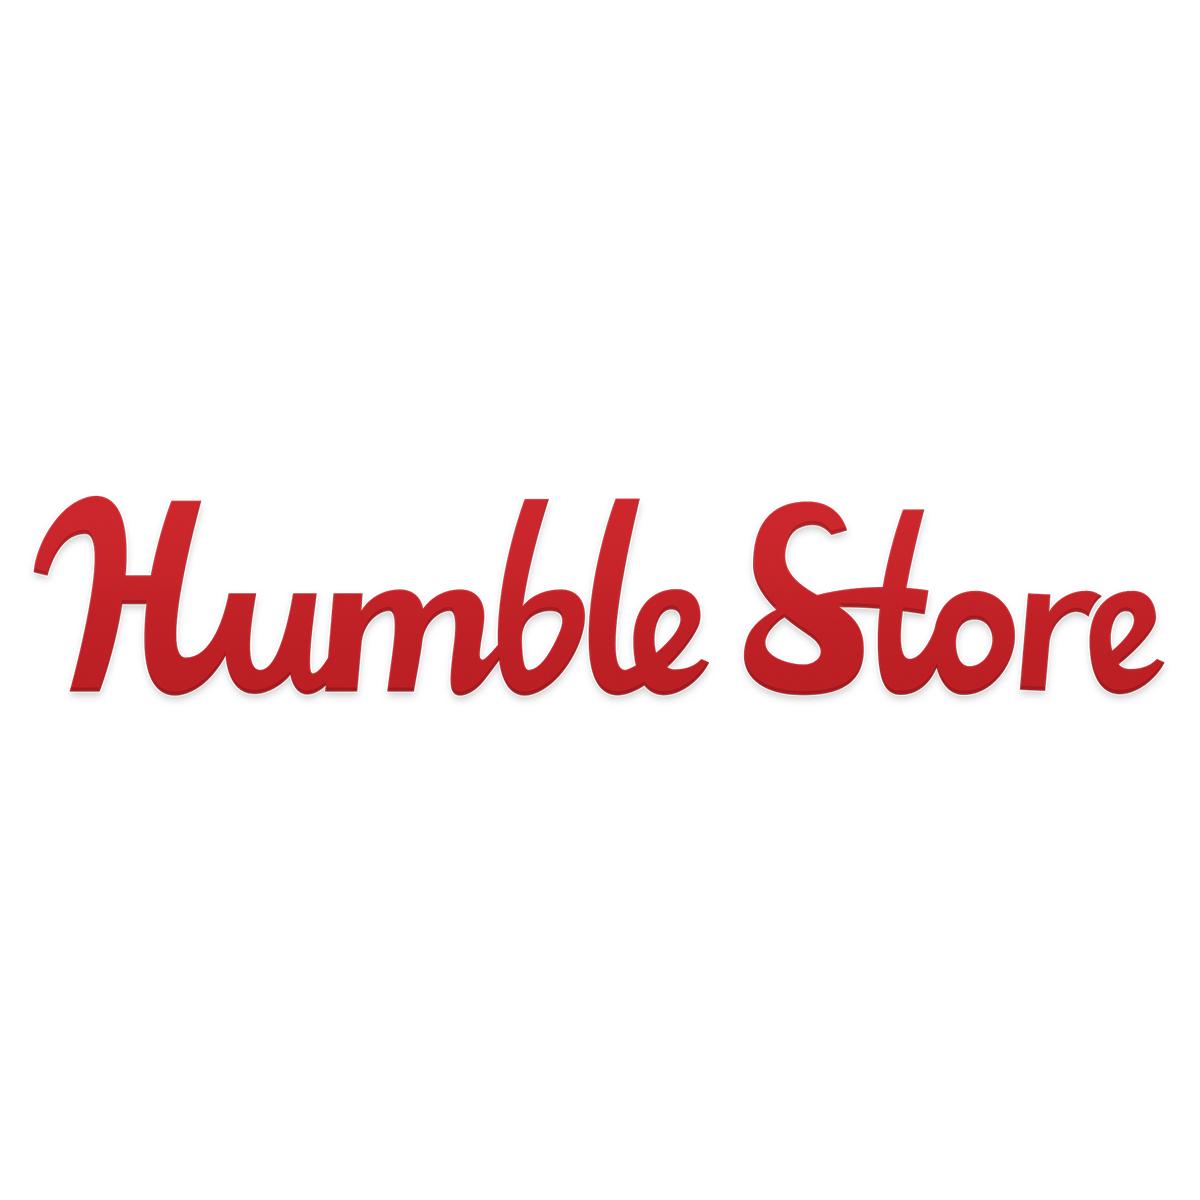 humble decision making Humble decision making  equity investing  are you a humble decision maker december 11, 2014 december 11, 2014 calminvestor 3 comments amitai etzioni, amos tversky, behavioral economics.